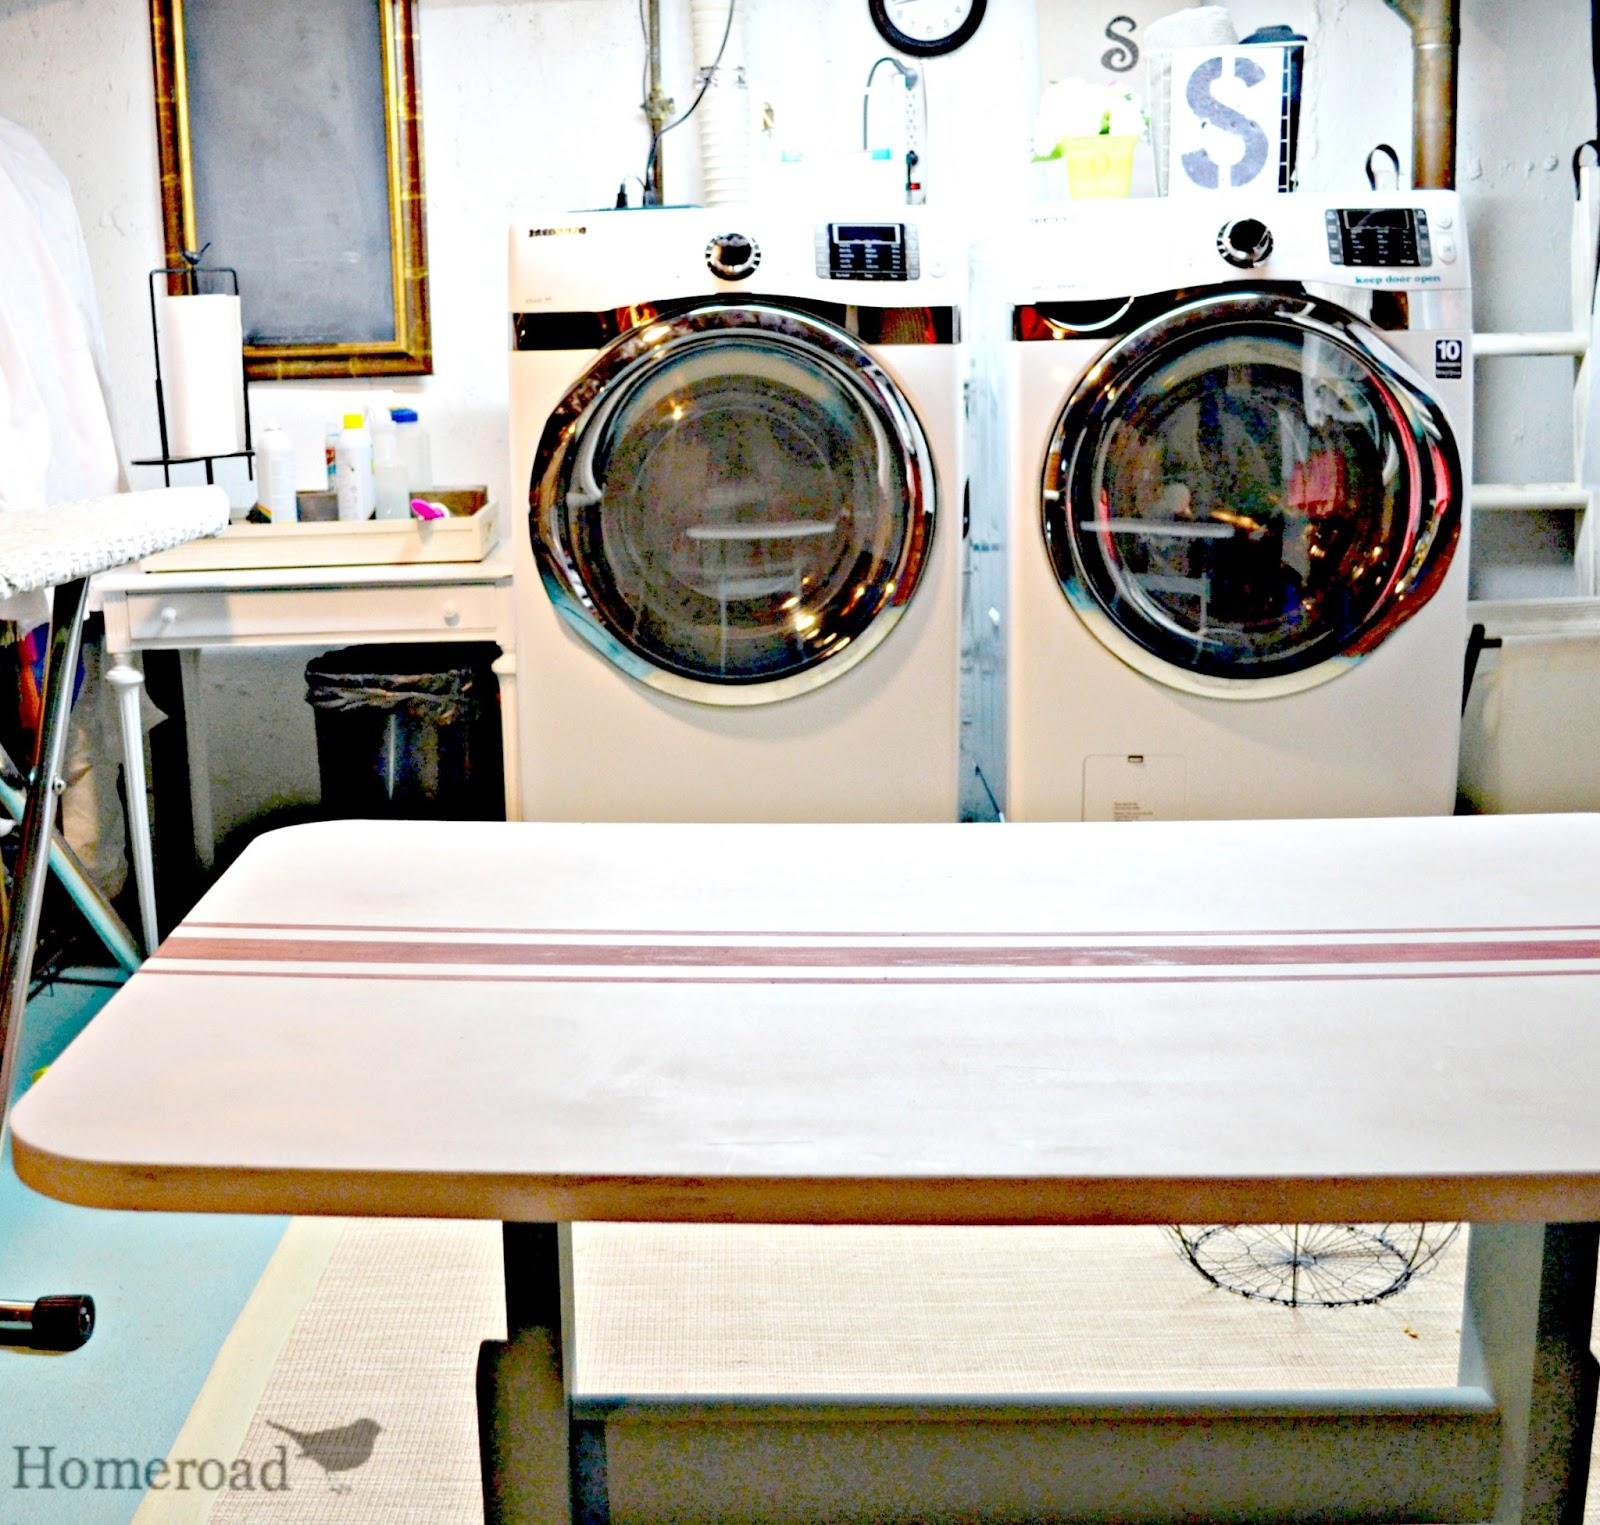 Grain Sack Striped Laundry Folding Table Homeroad